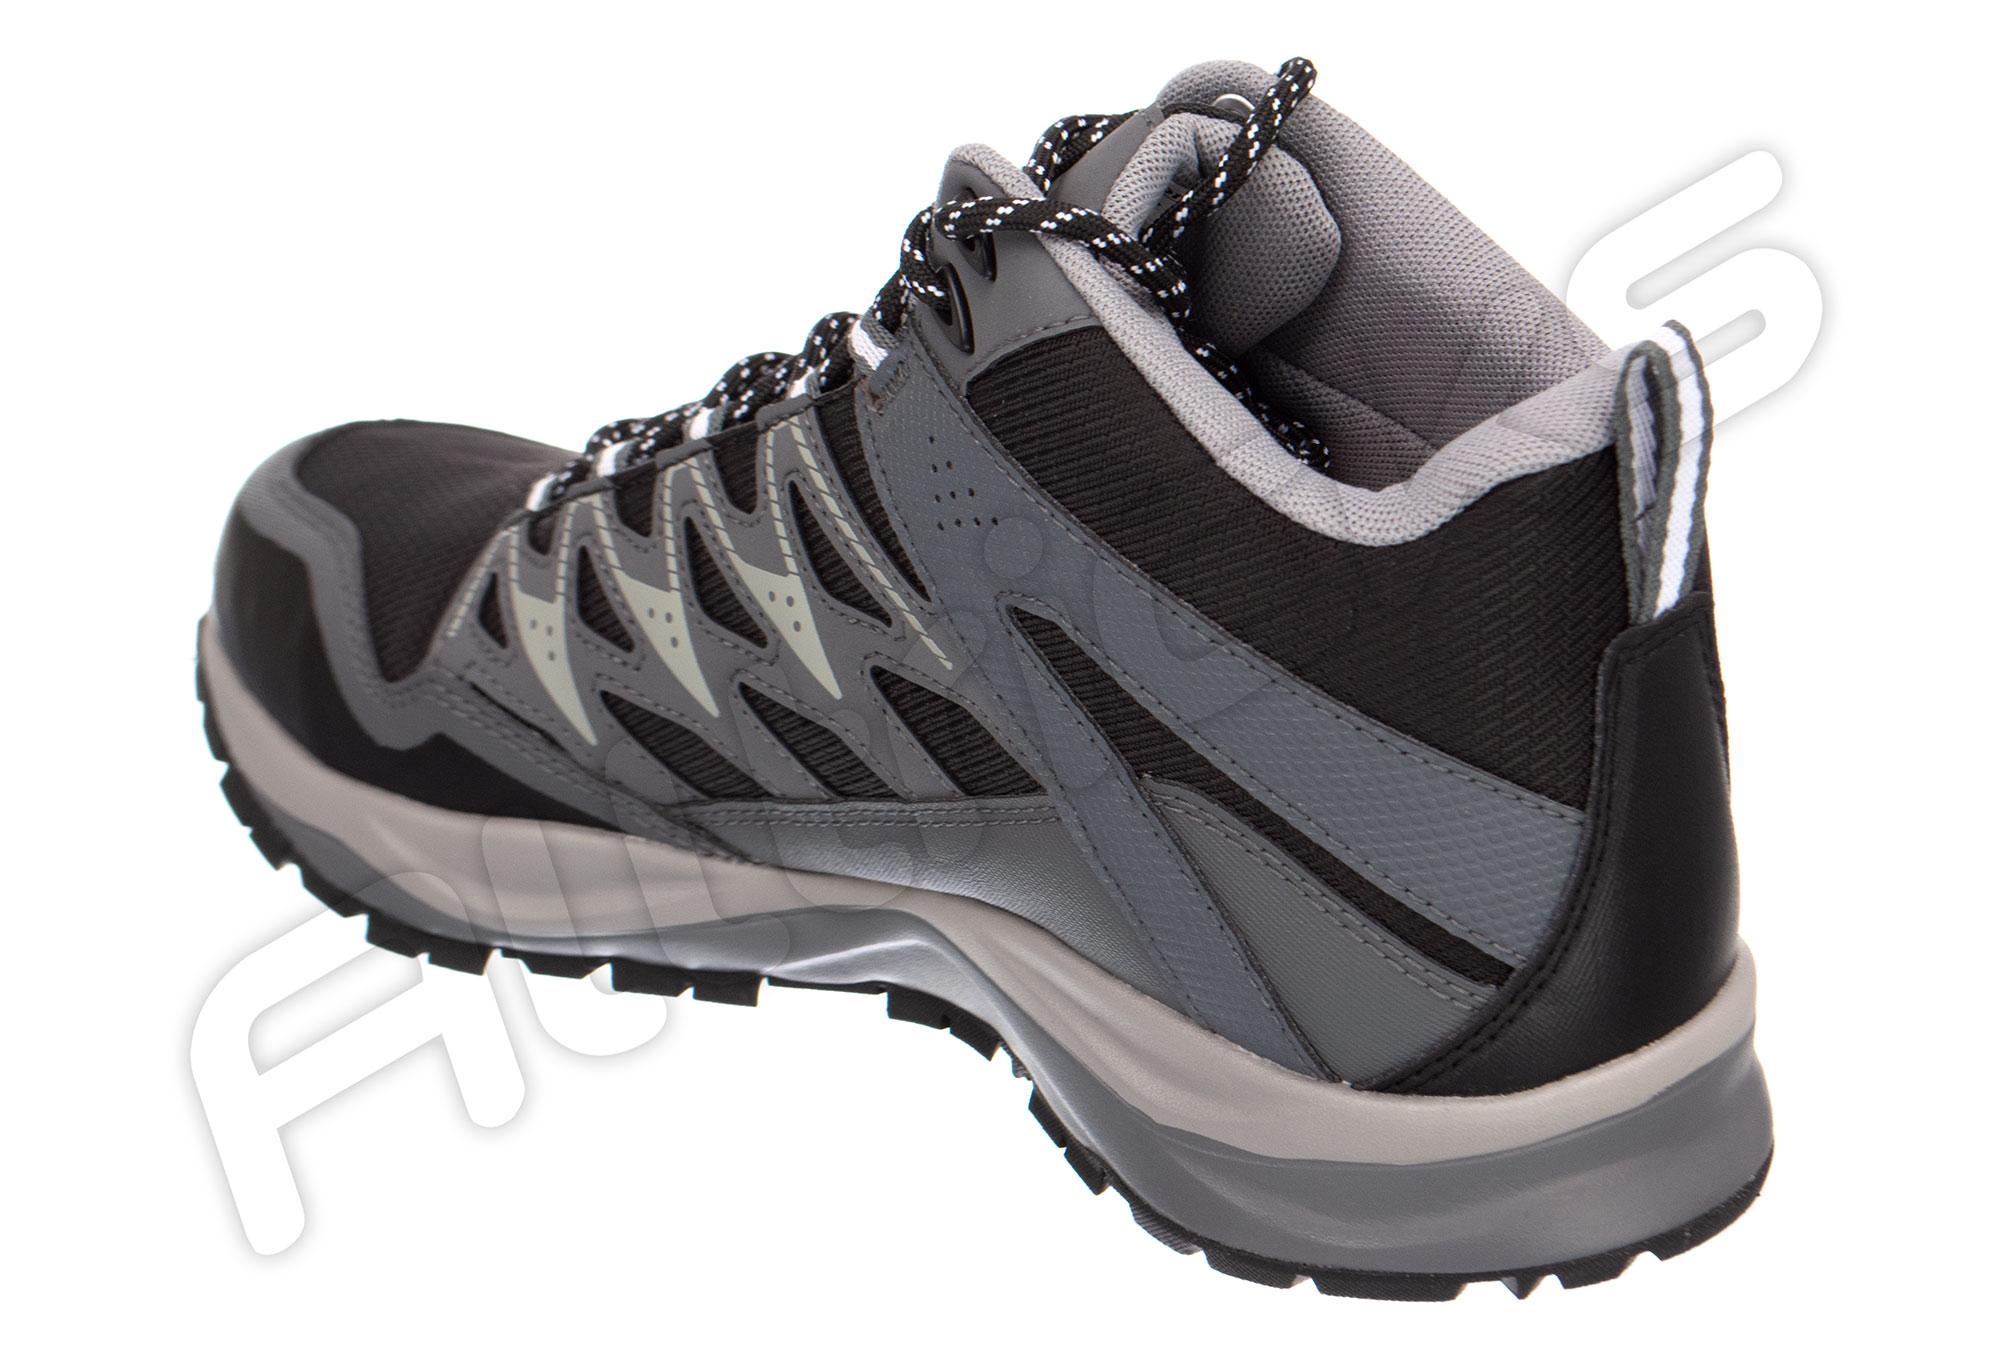 30805d0bcf1 Zapatos Columbia Wayfinder Mid Outdry Negro Blanco